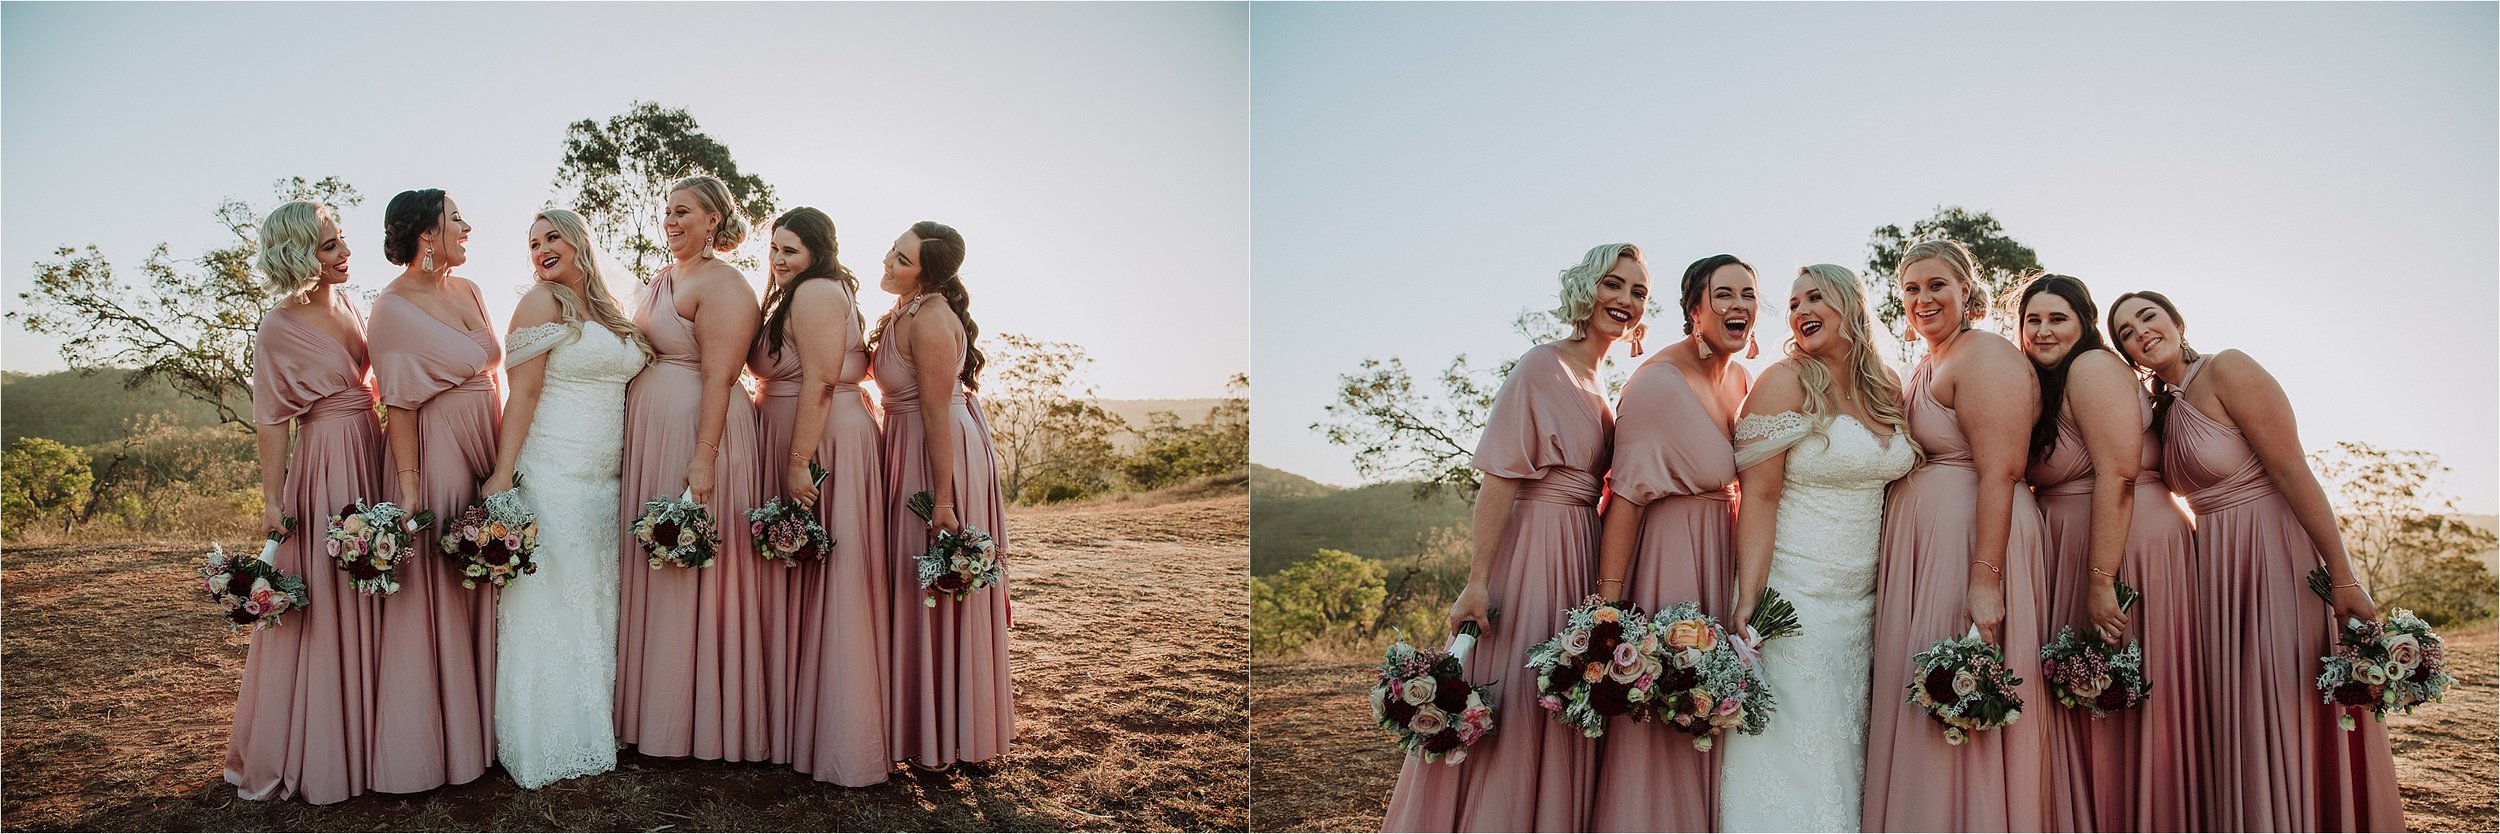 Towoomba - Preston - Peak - Wedding - Gold - Coast - Wedding - Photographers_0054.jpg